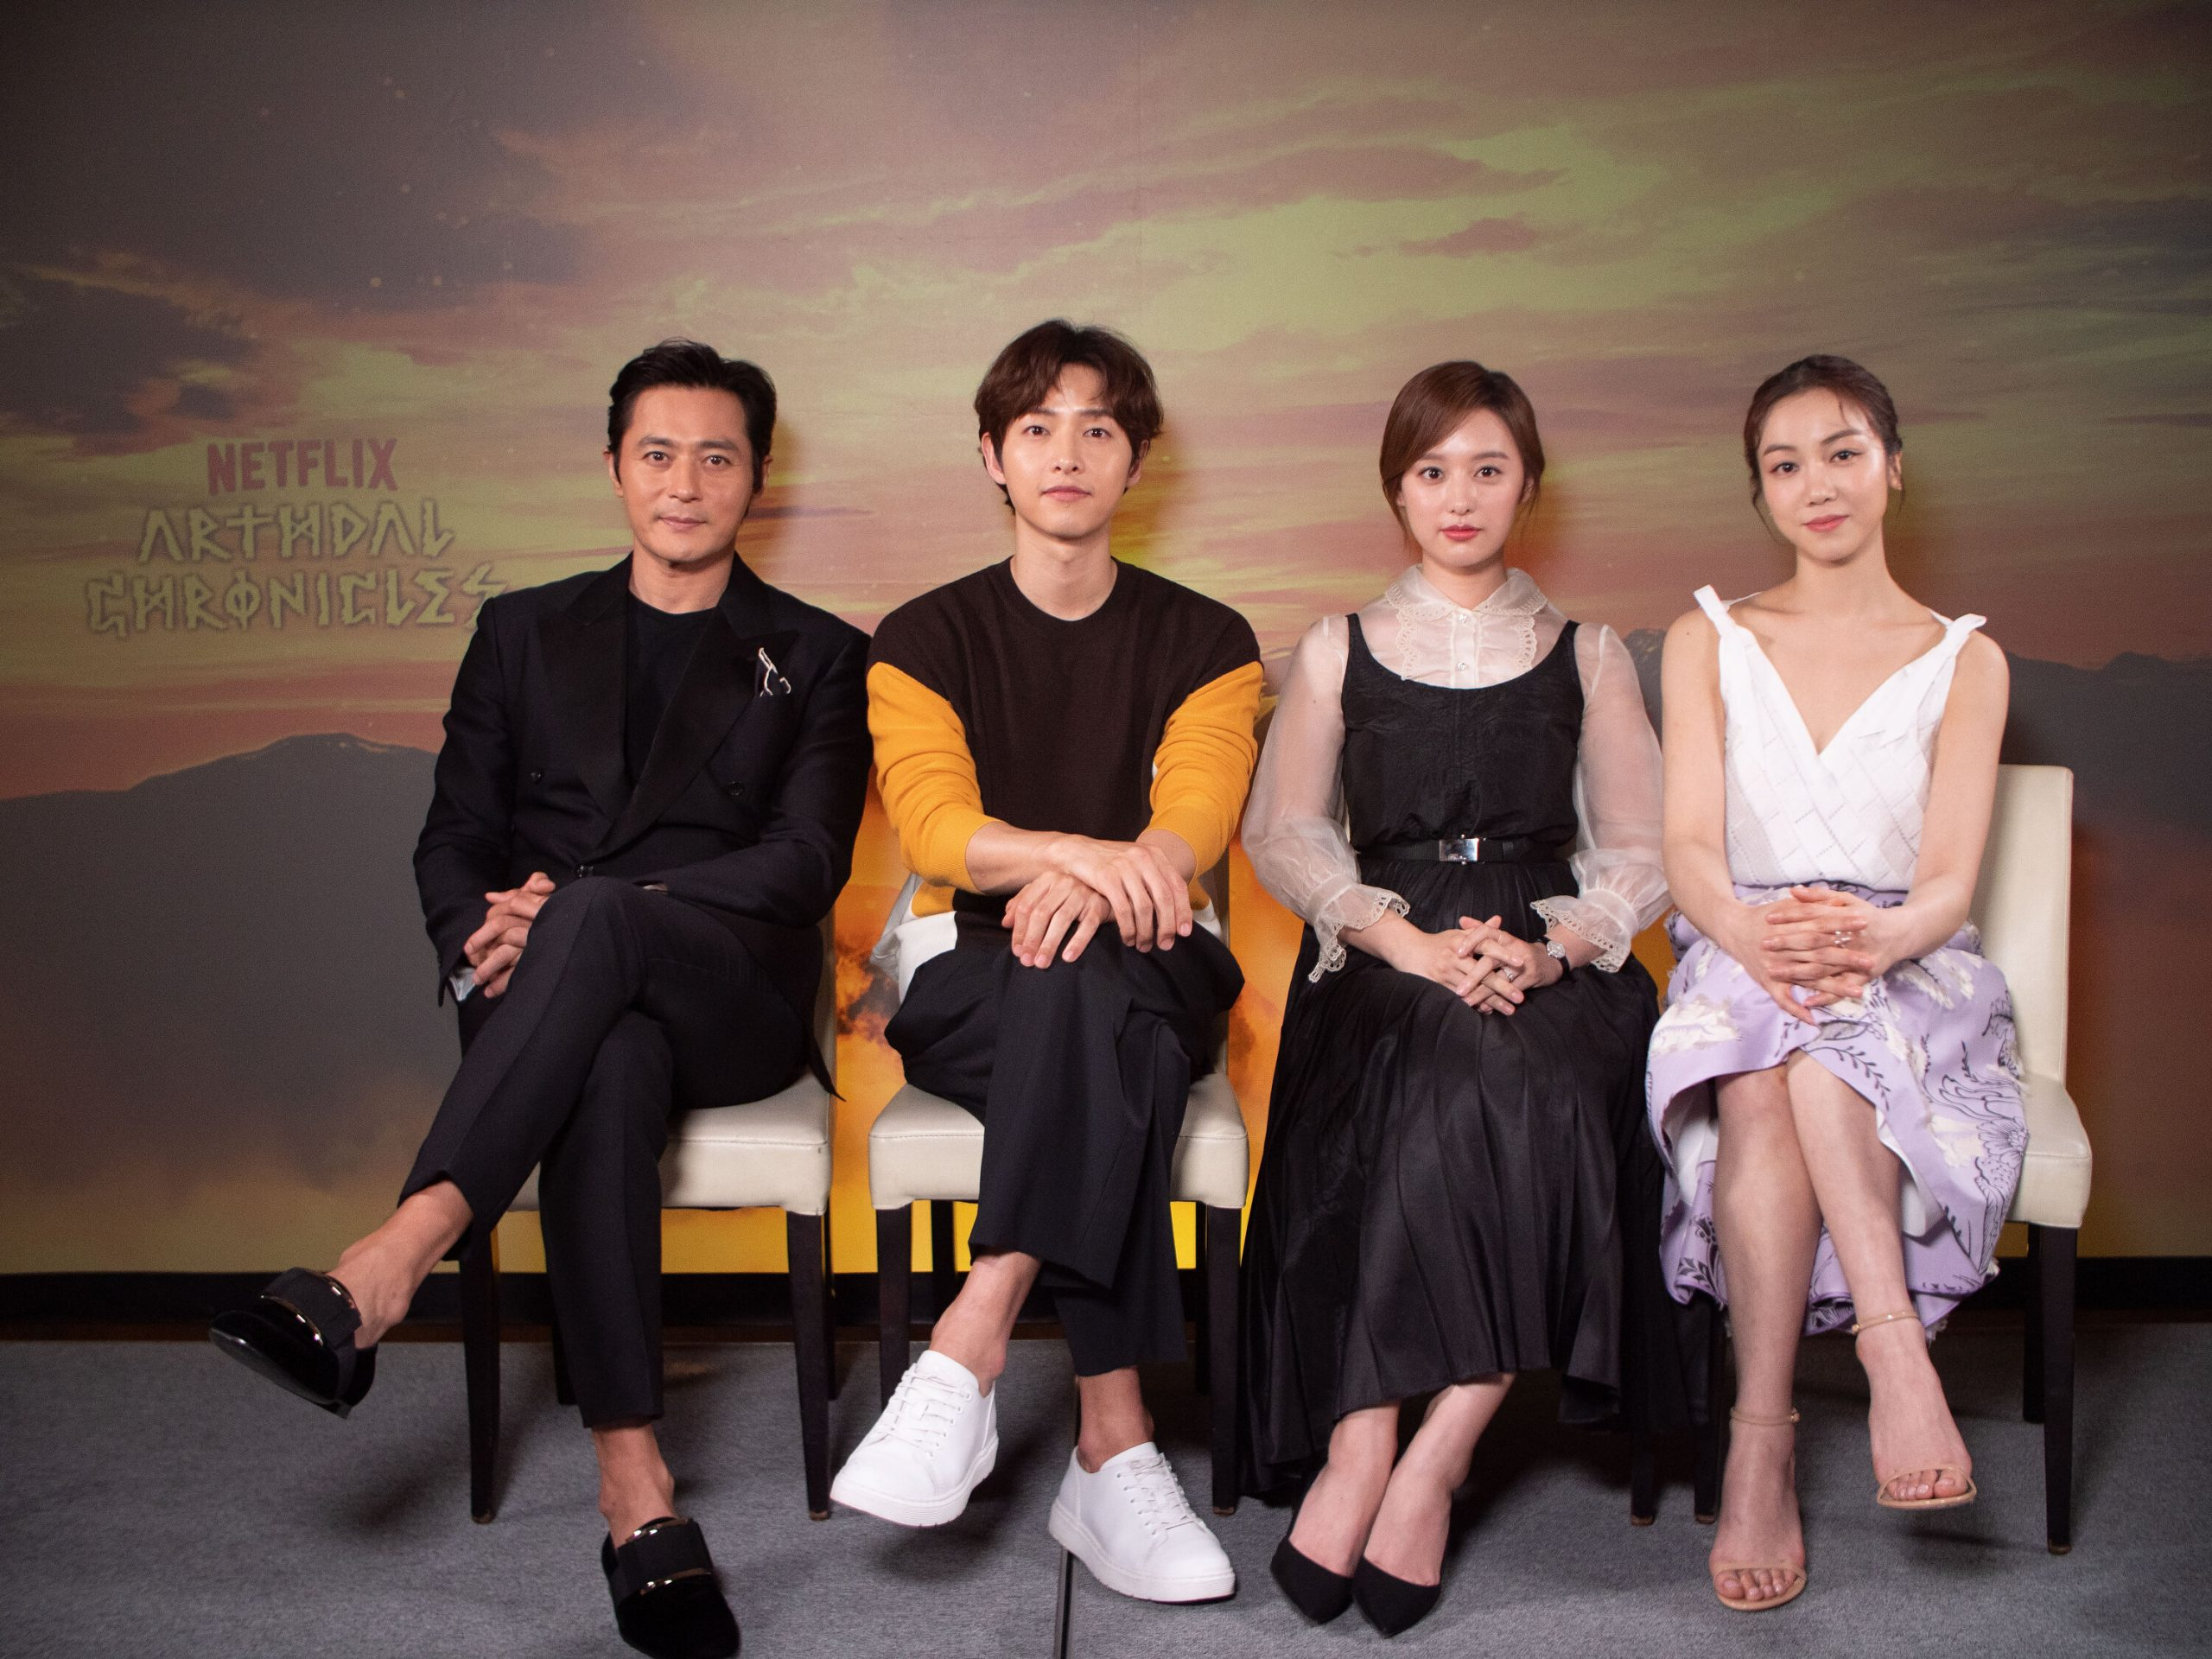 Cast of Arthdal Chronicles season 2